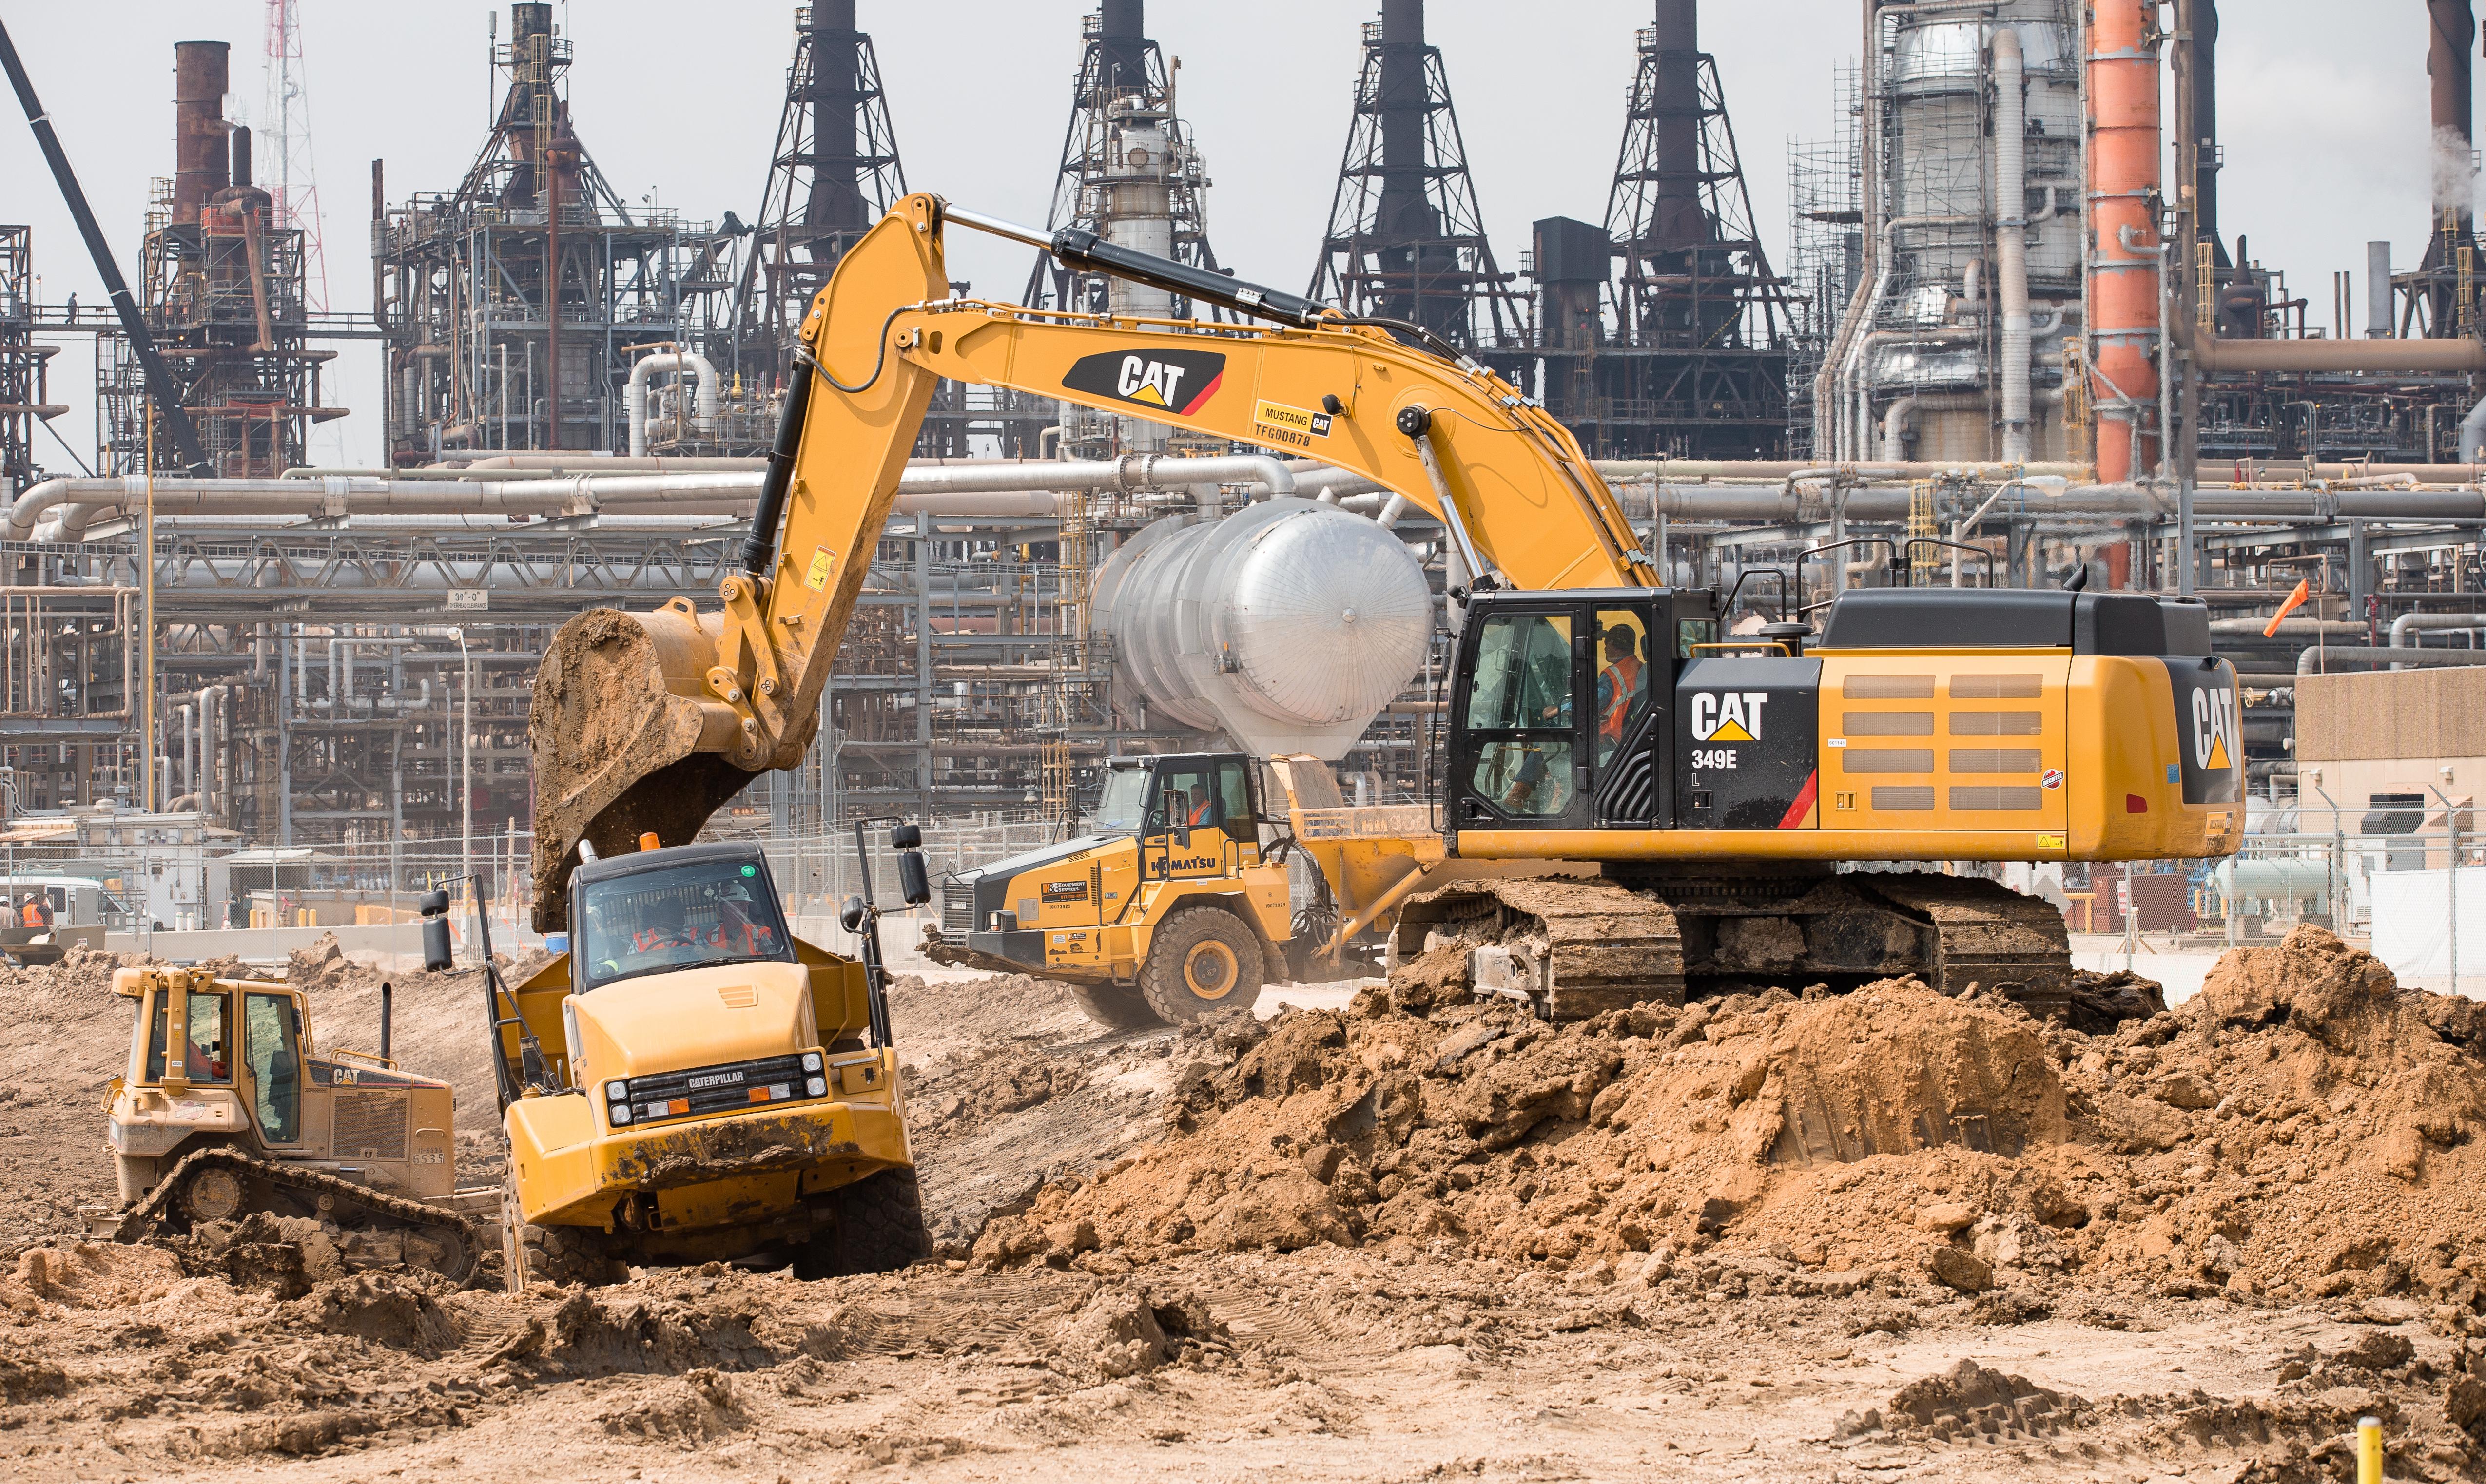 ExxonMobil Chemical Company Begins Multi-Billion Dollar ...